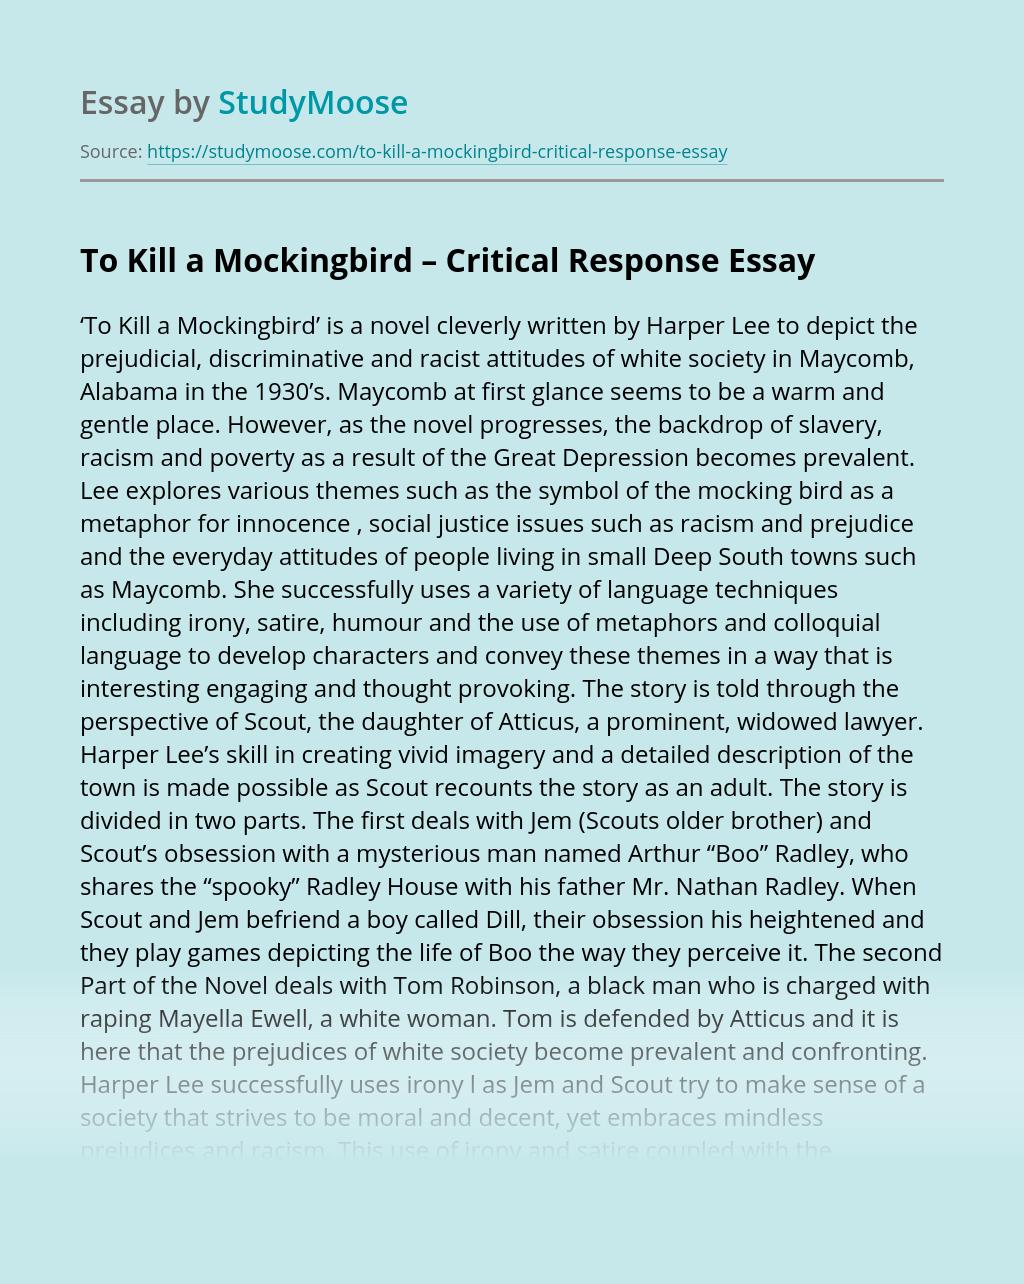 To Kill a Mockingbird – Critical Response